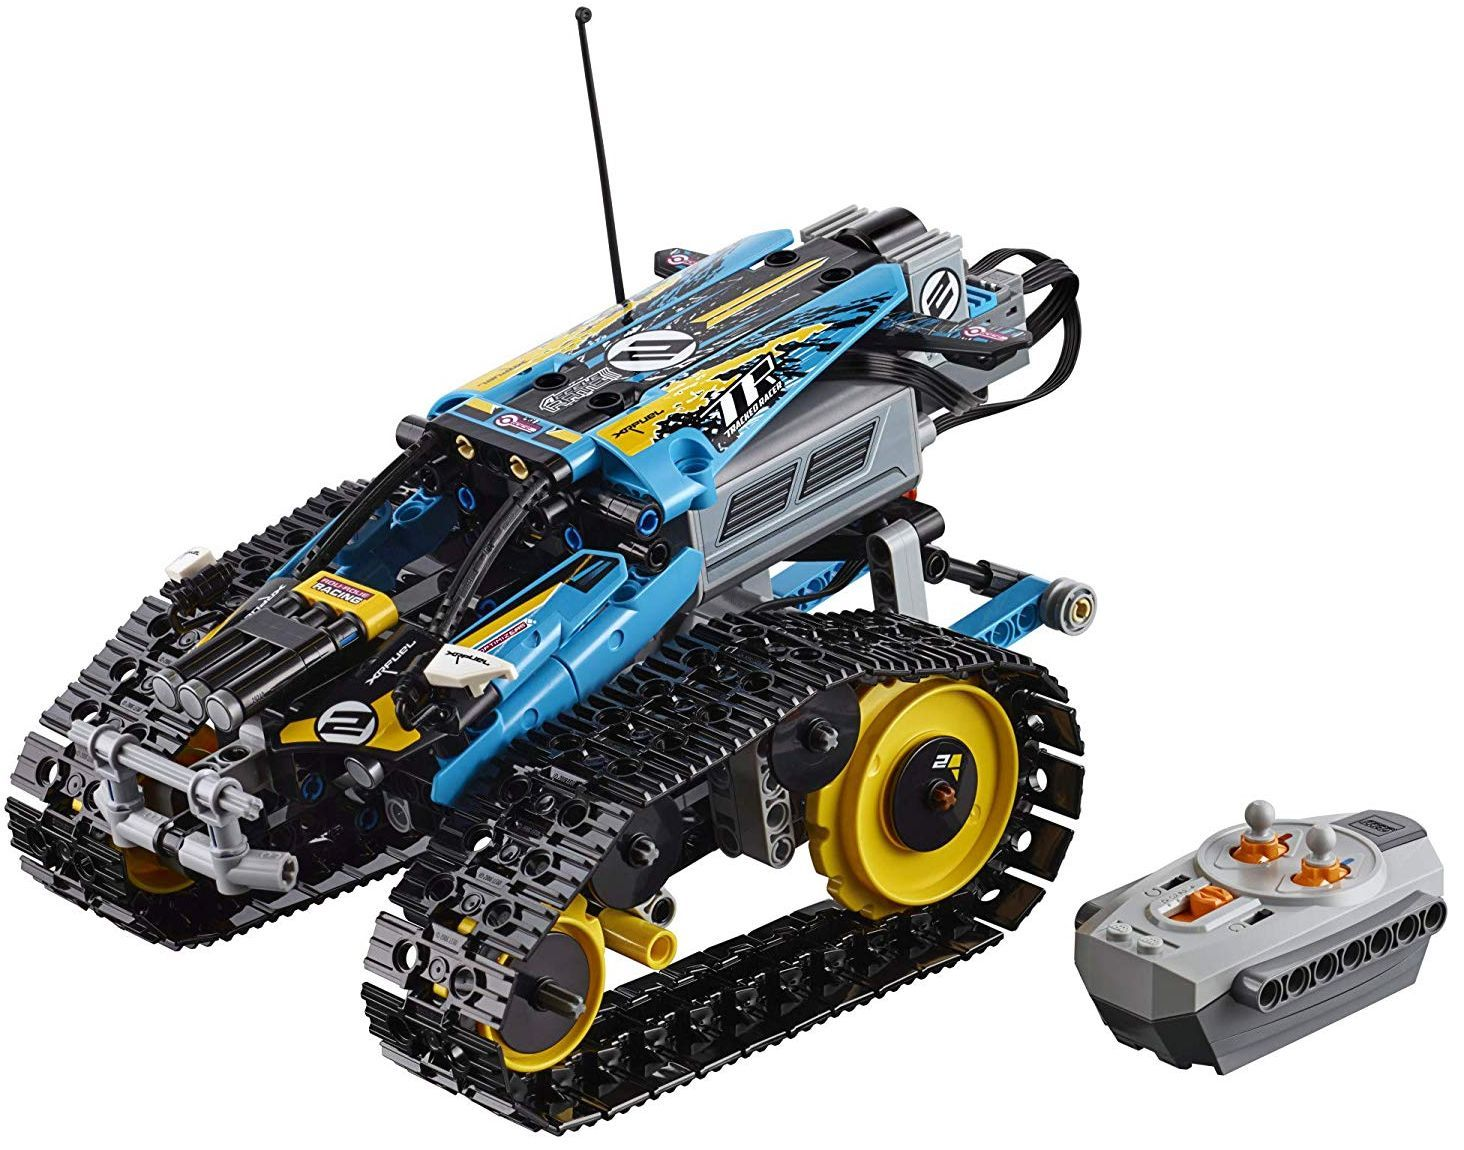 Конструктор Lego Technic - Каскадьорска кола, с дистанционно управление (42095) - 4